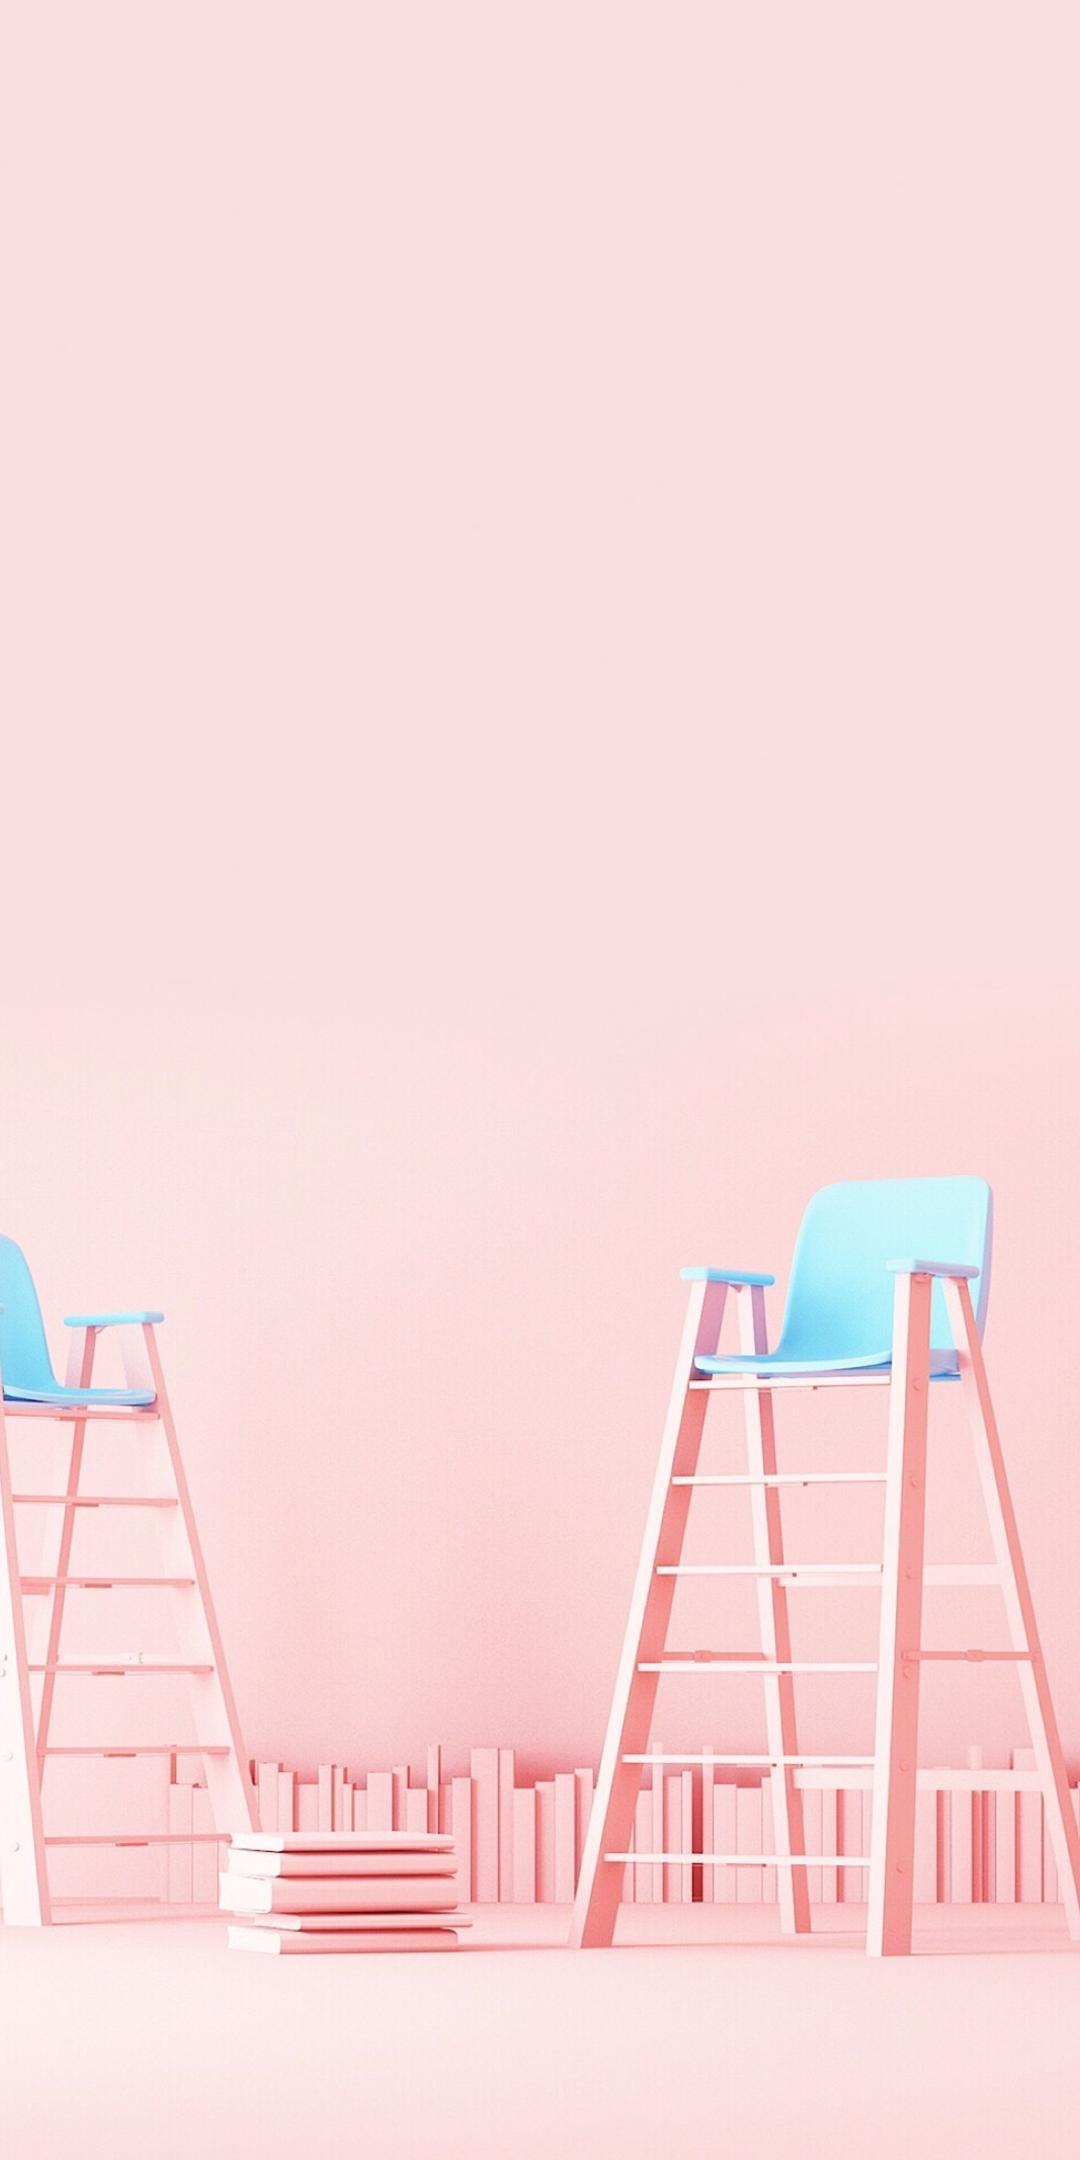 5e67b899b9842 - 粉色系少女心手机壁纸